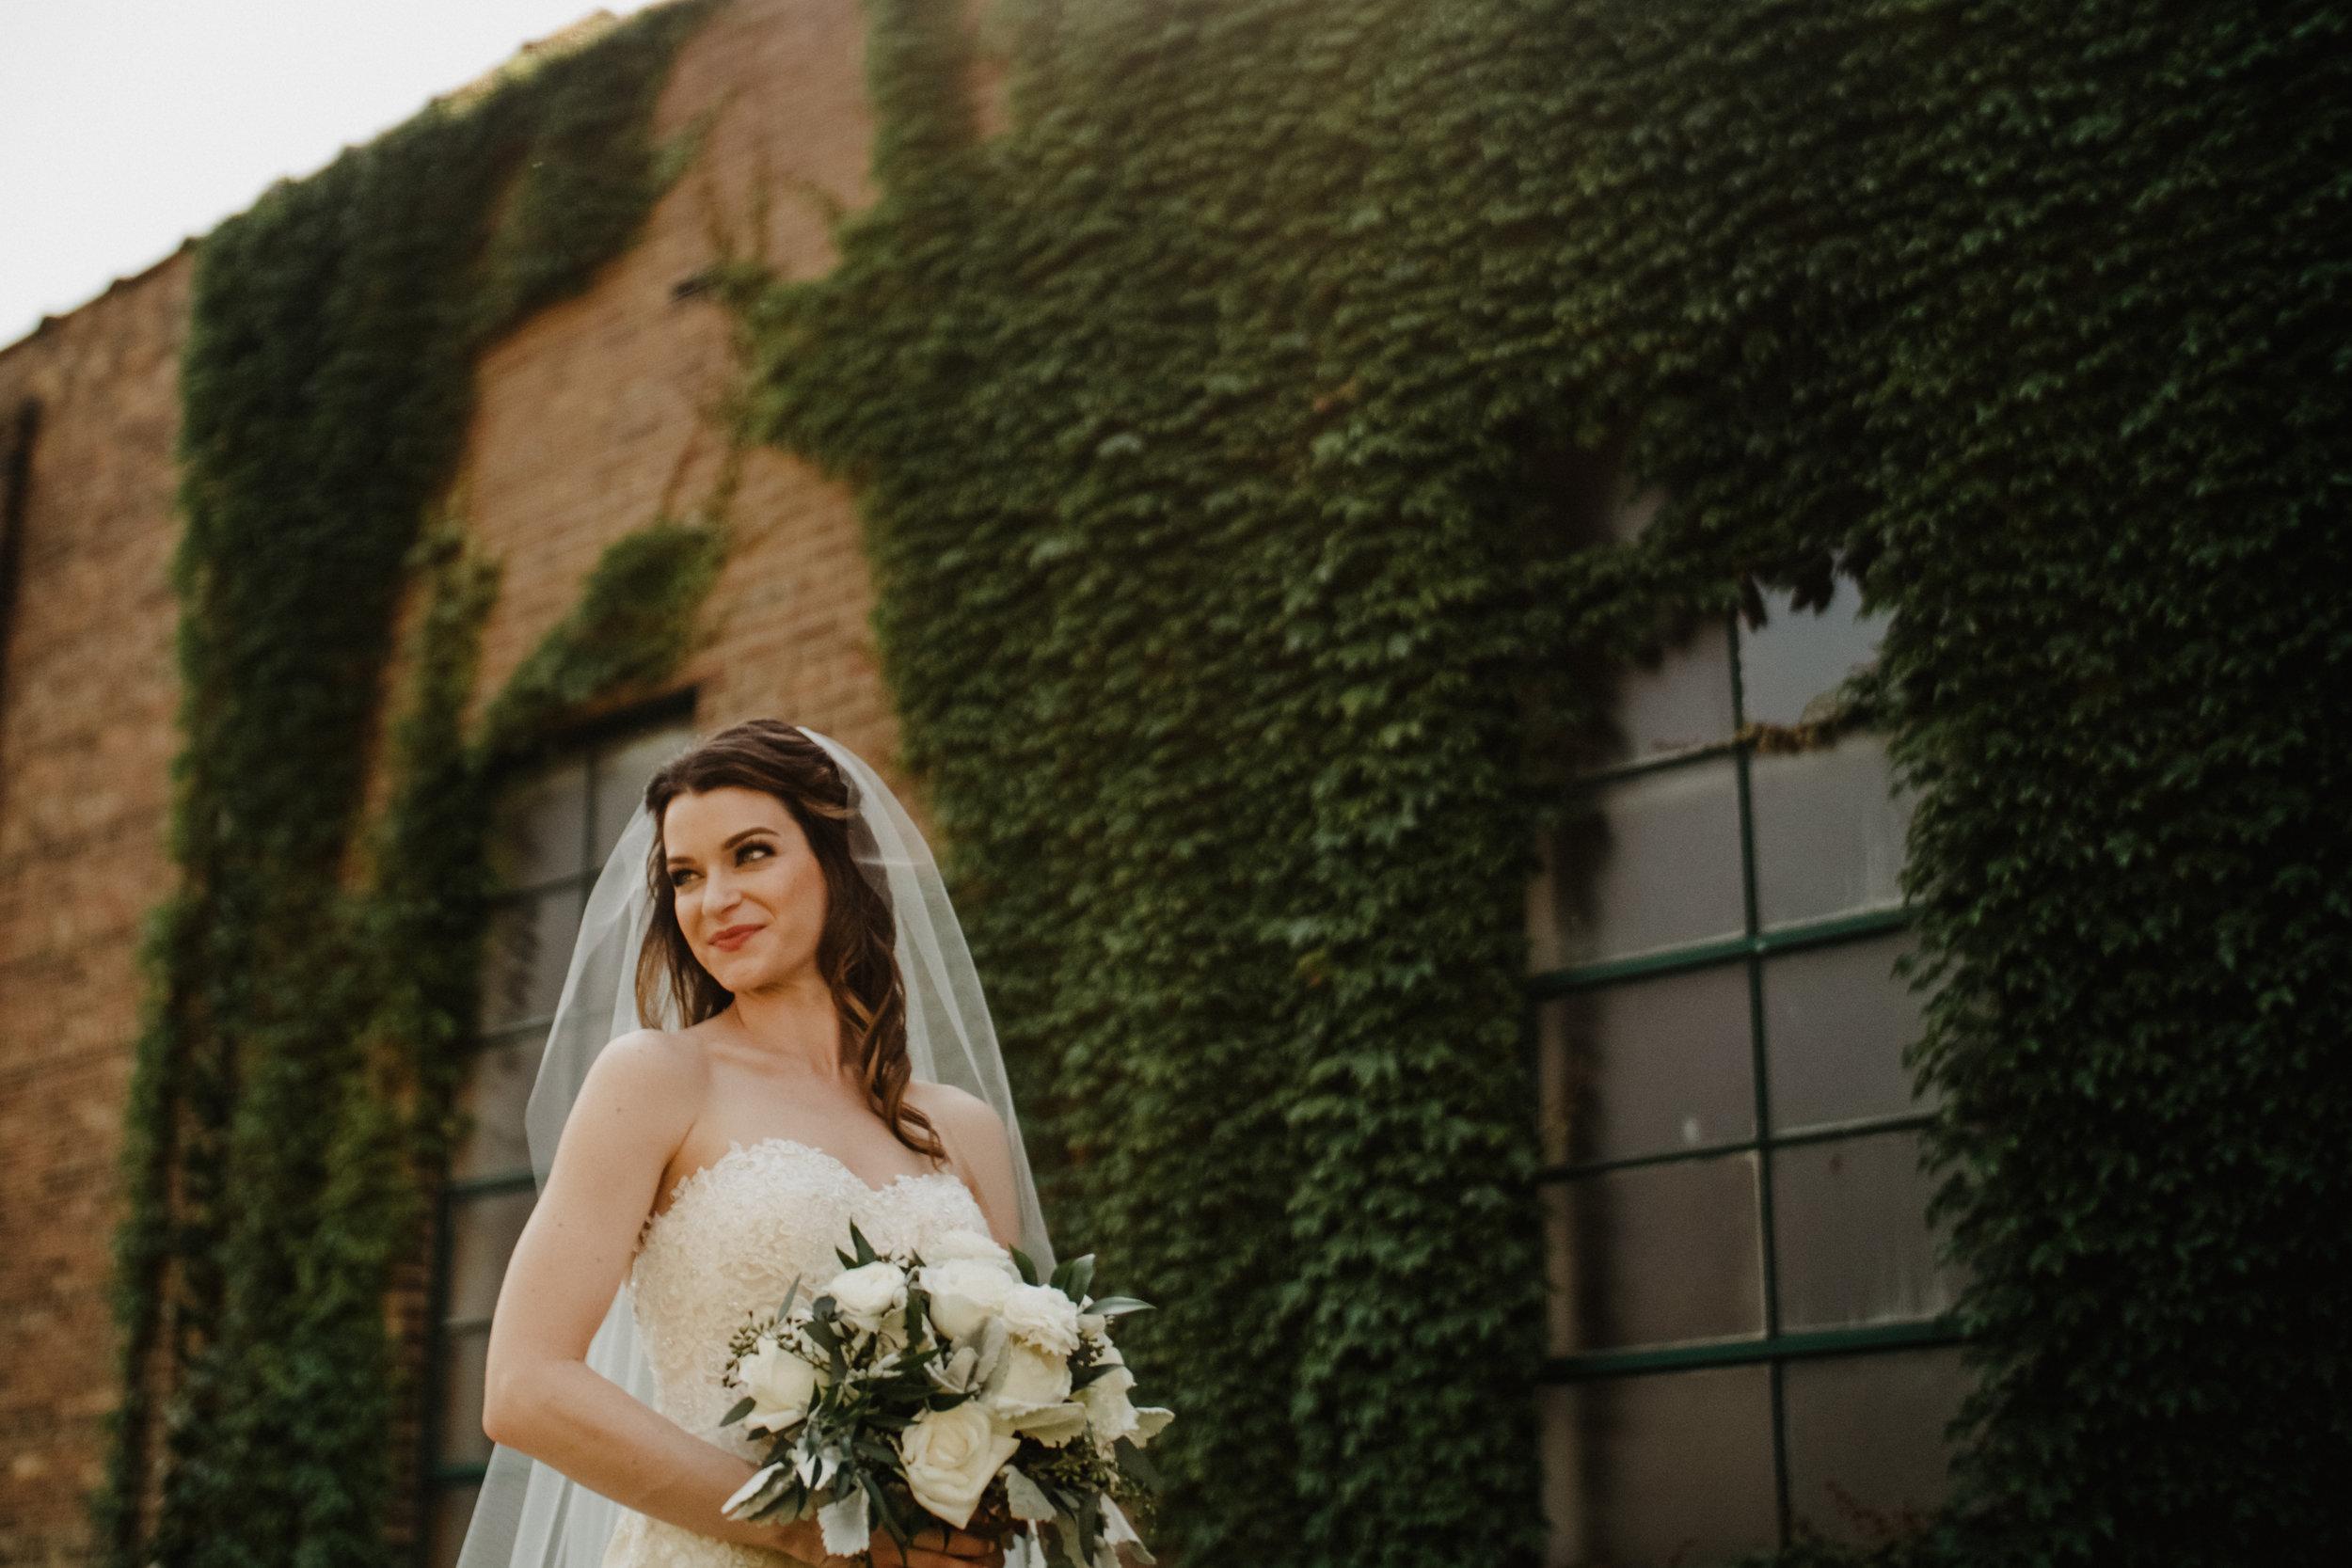 Janet-Alex-Benton-Harbor-Wedding-Party-05